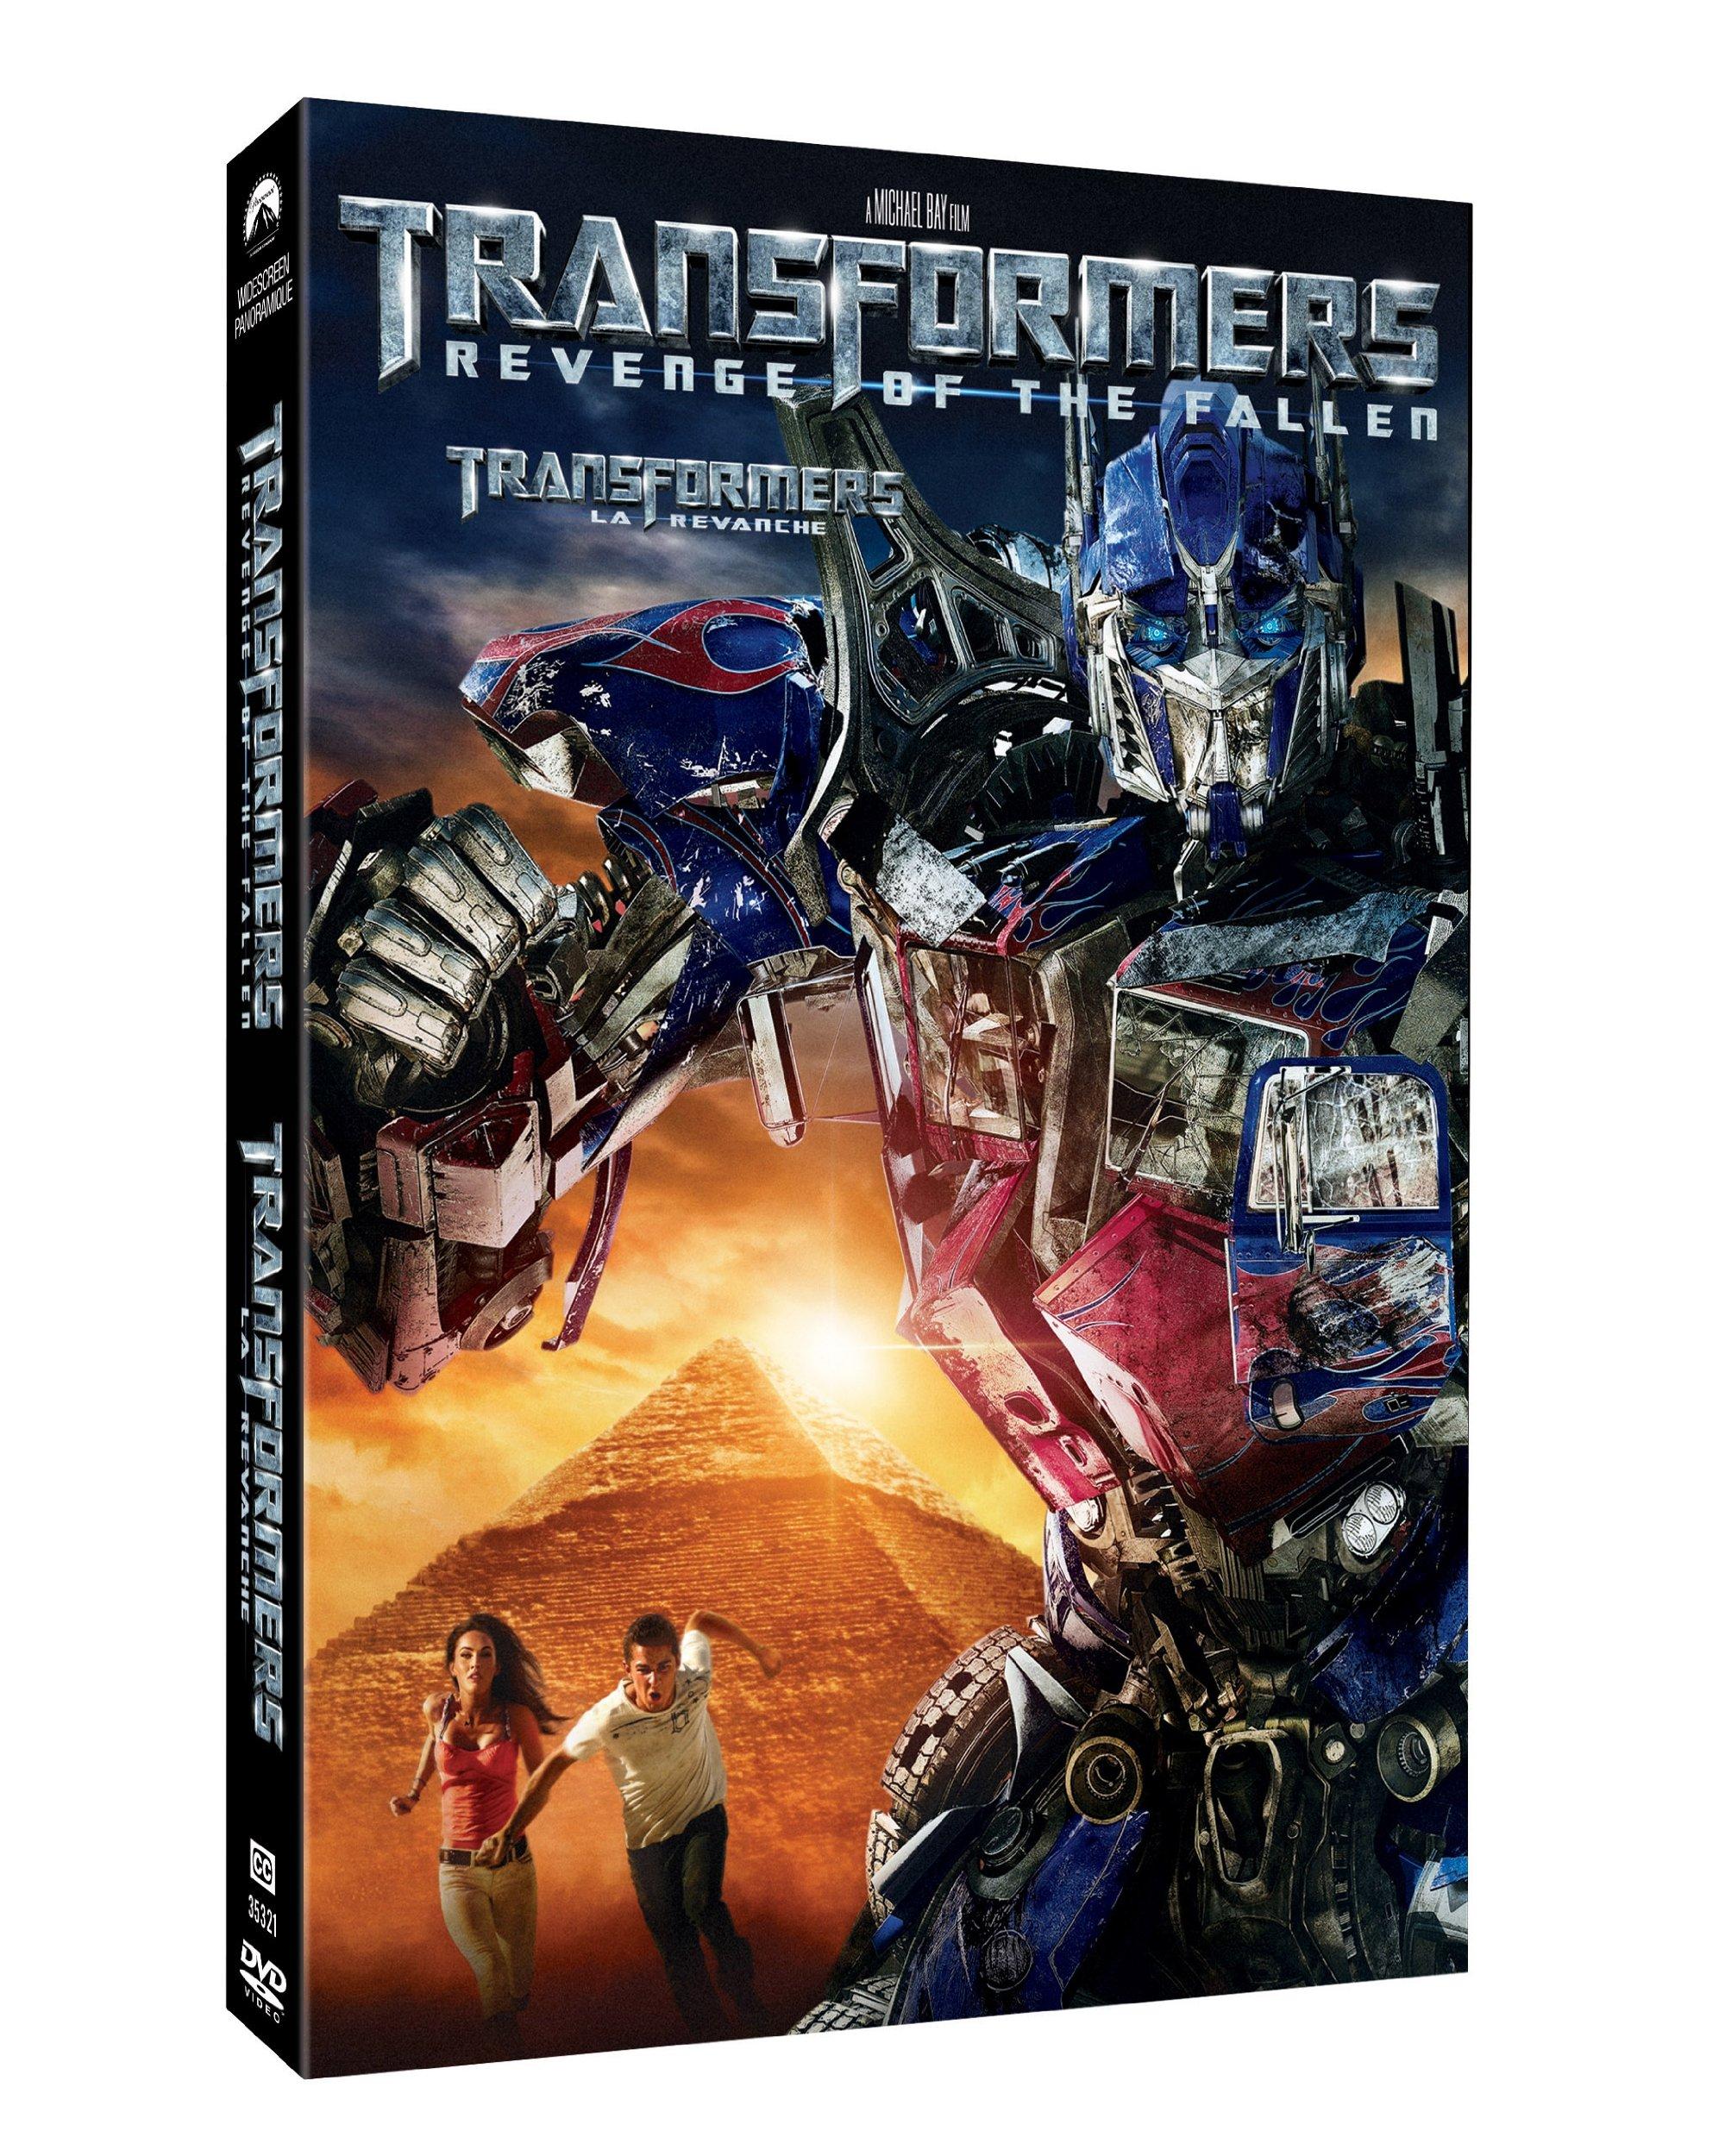 Achat des DVD et Blu-ray des Films Transformers 91atXgDNSIL